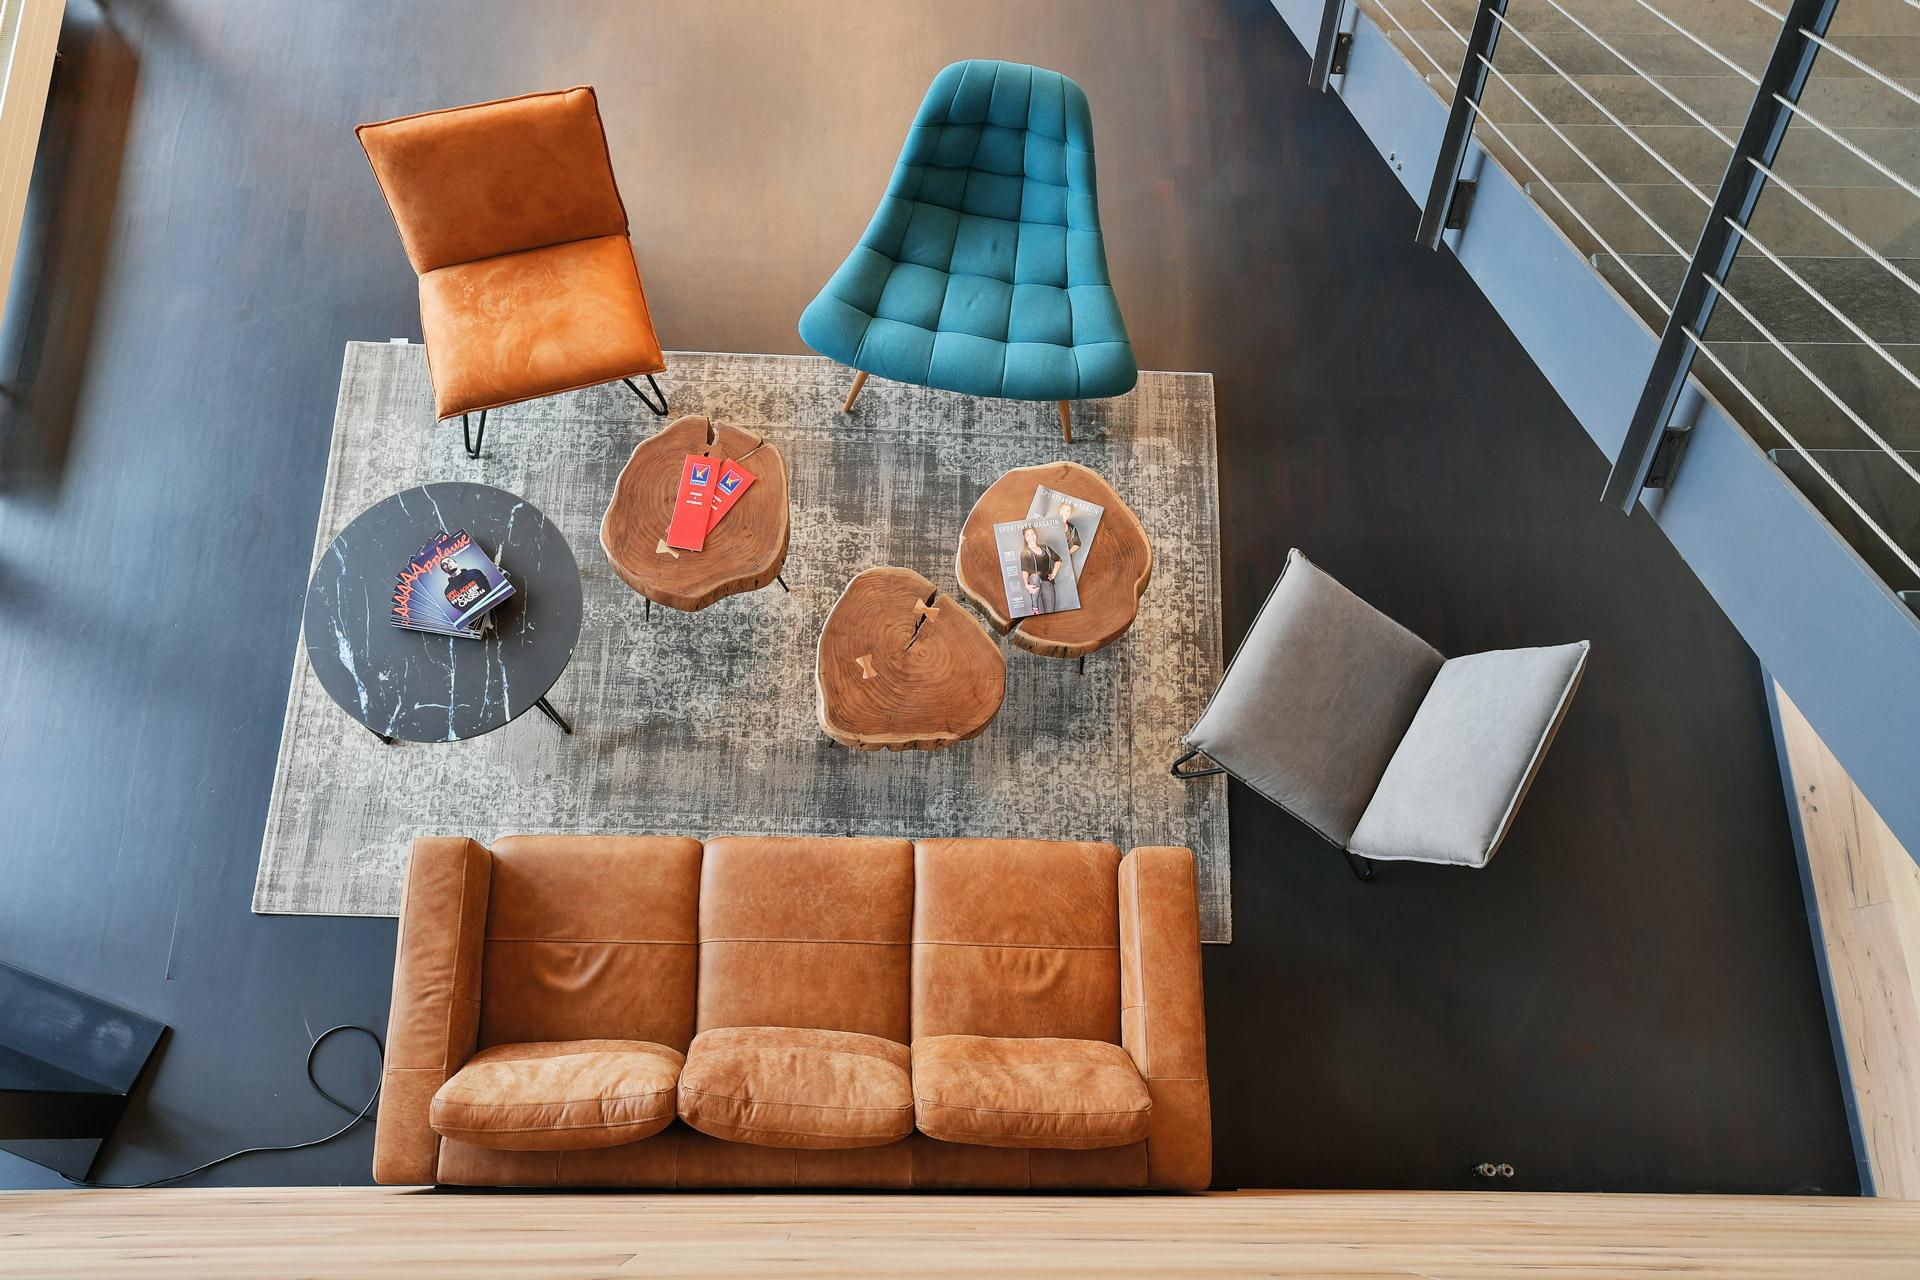 lounge-sportpark-freiburg-1920x1280px